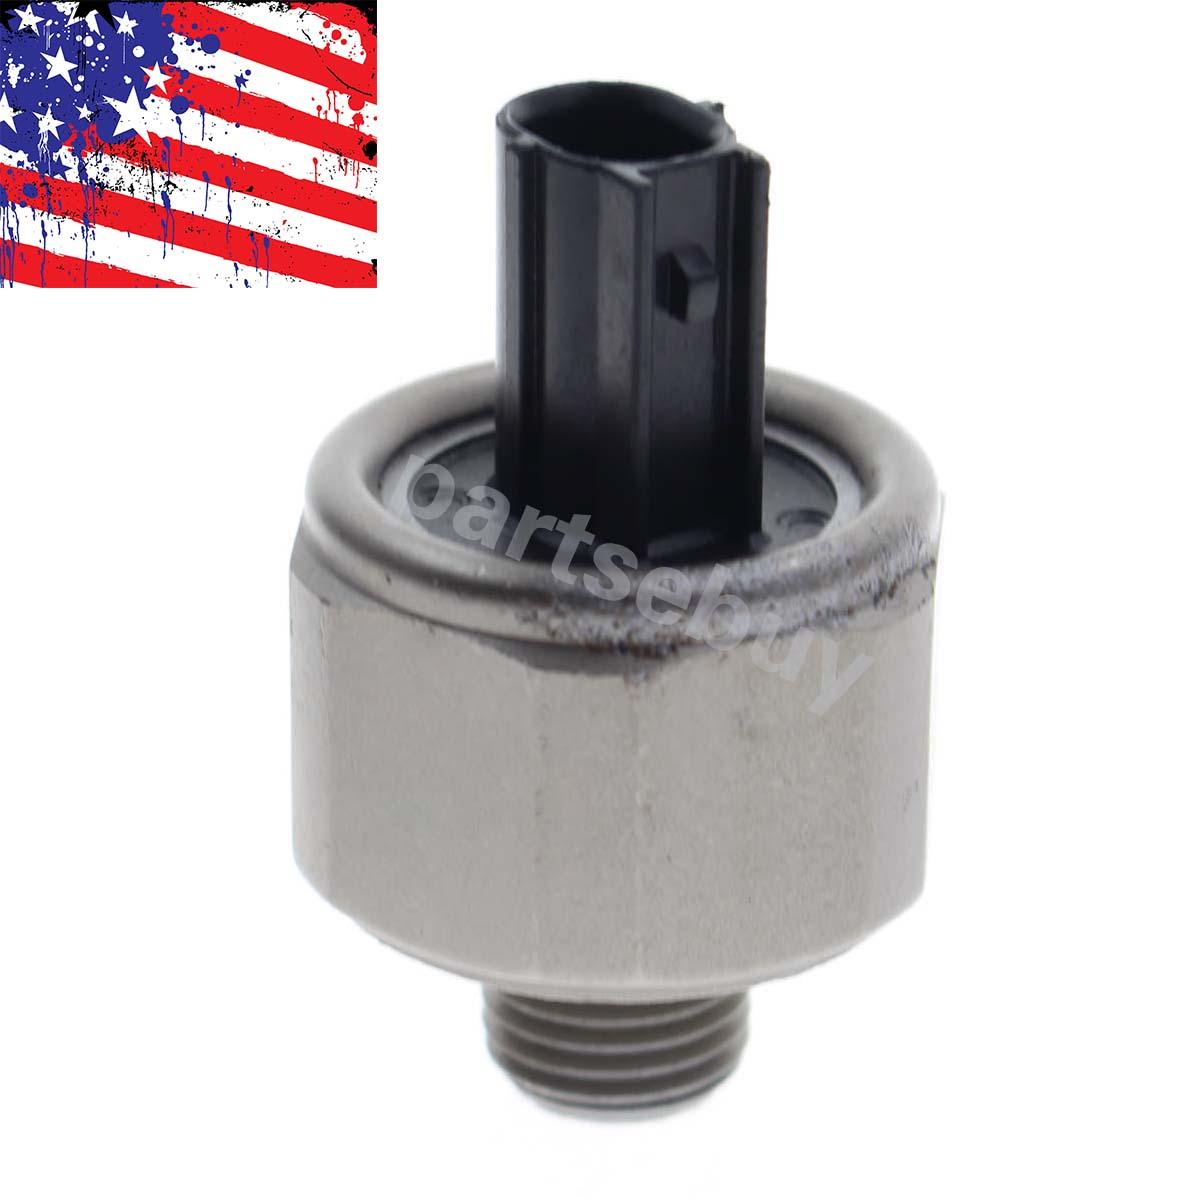 OEM Knock Sensor 30530-PPL-A01 For Honda Accord Civic CR-V